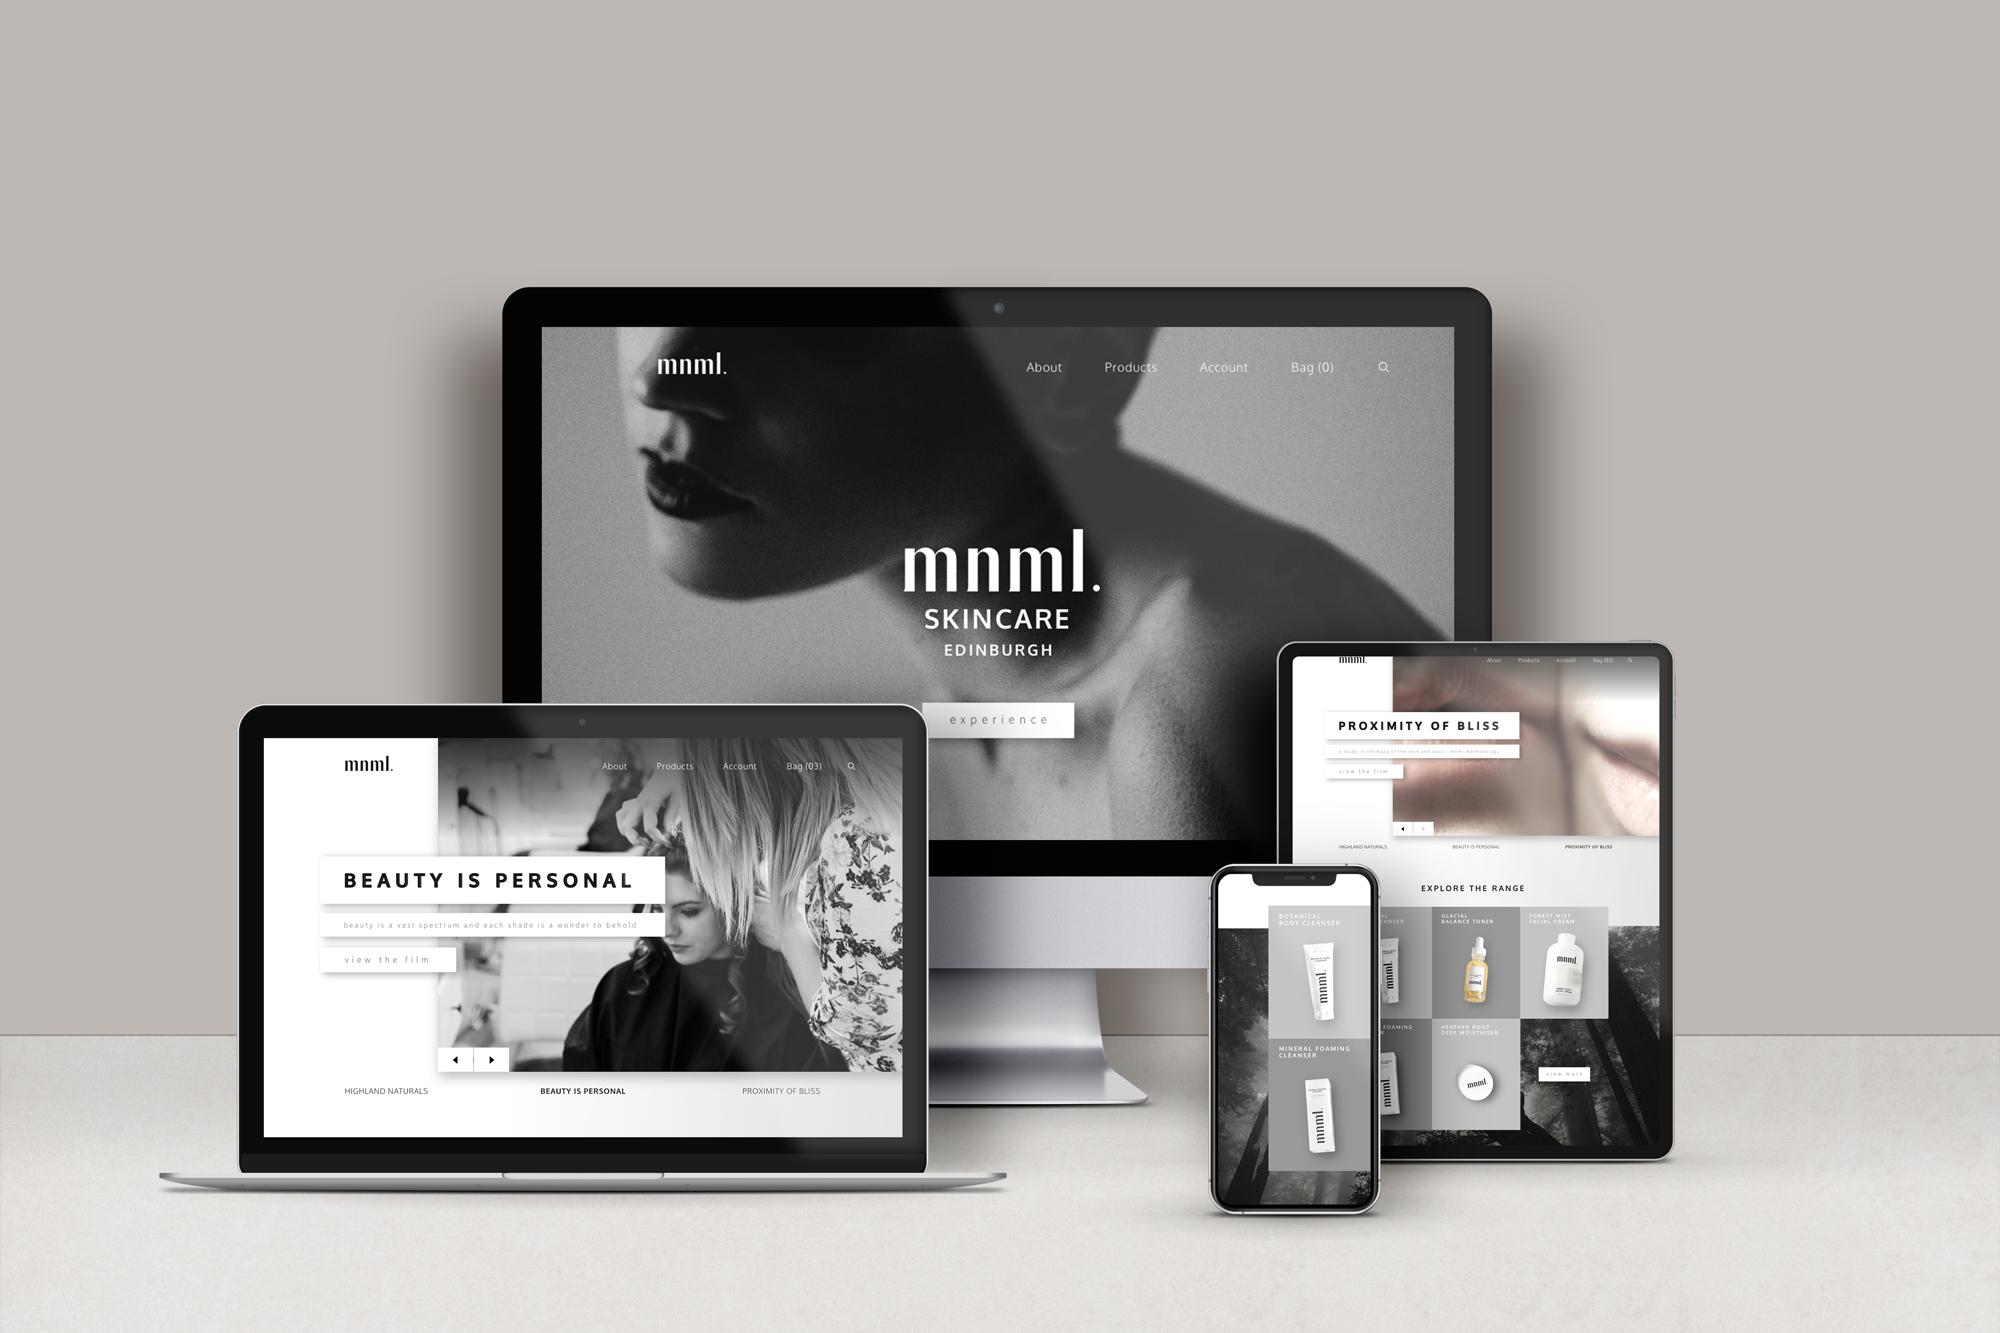 Mnml-Website-Design-London-Agency-Studio-77.jpg